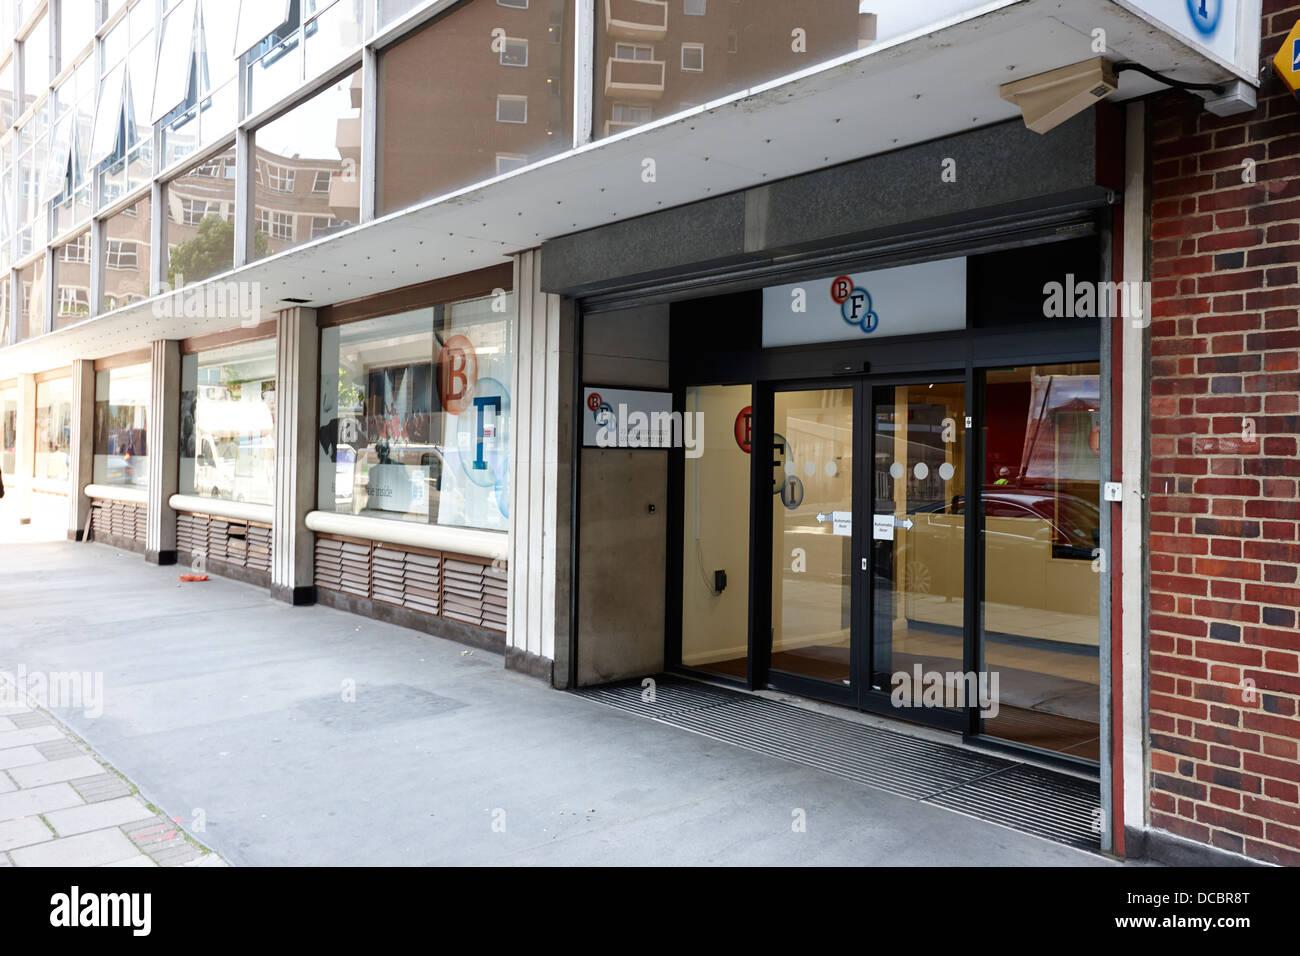 bfi the british film institute offices stephen street London England UK - Stock Image